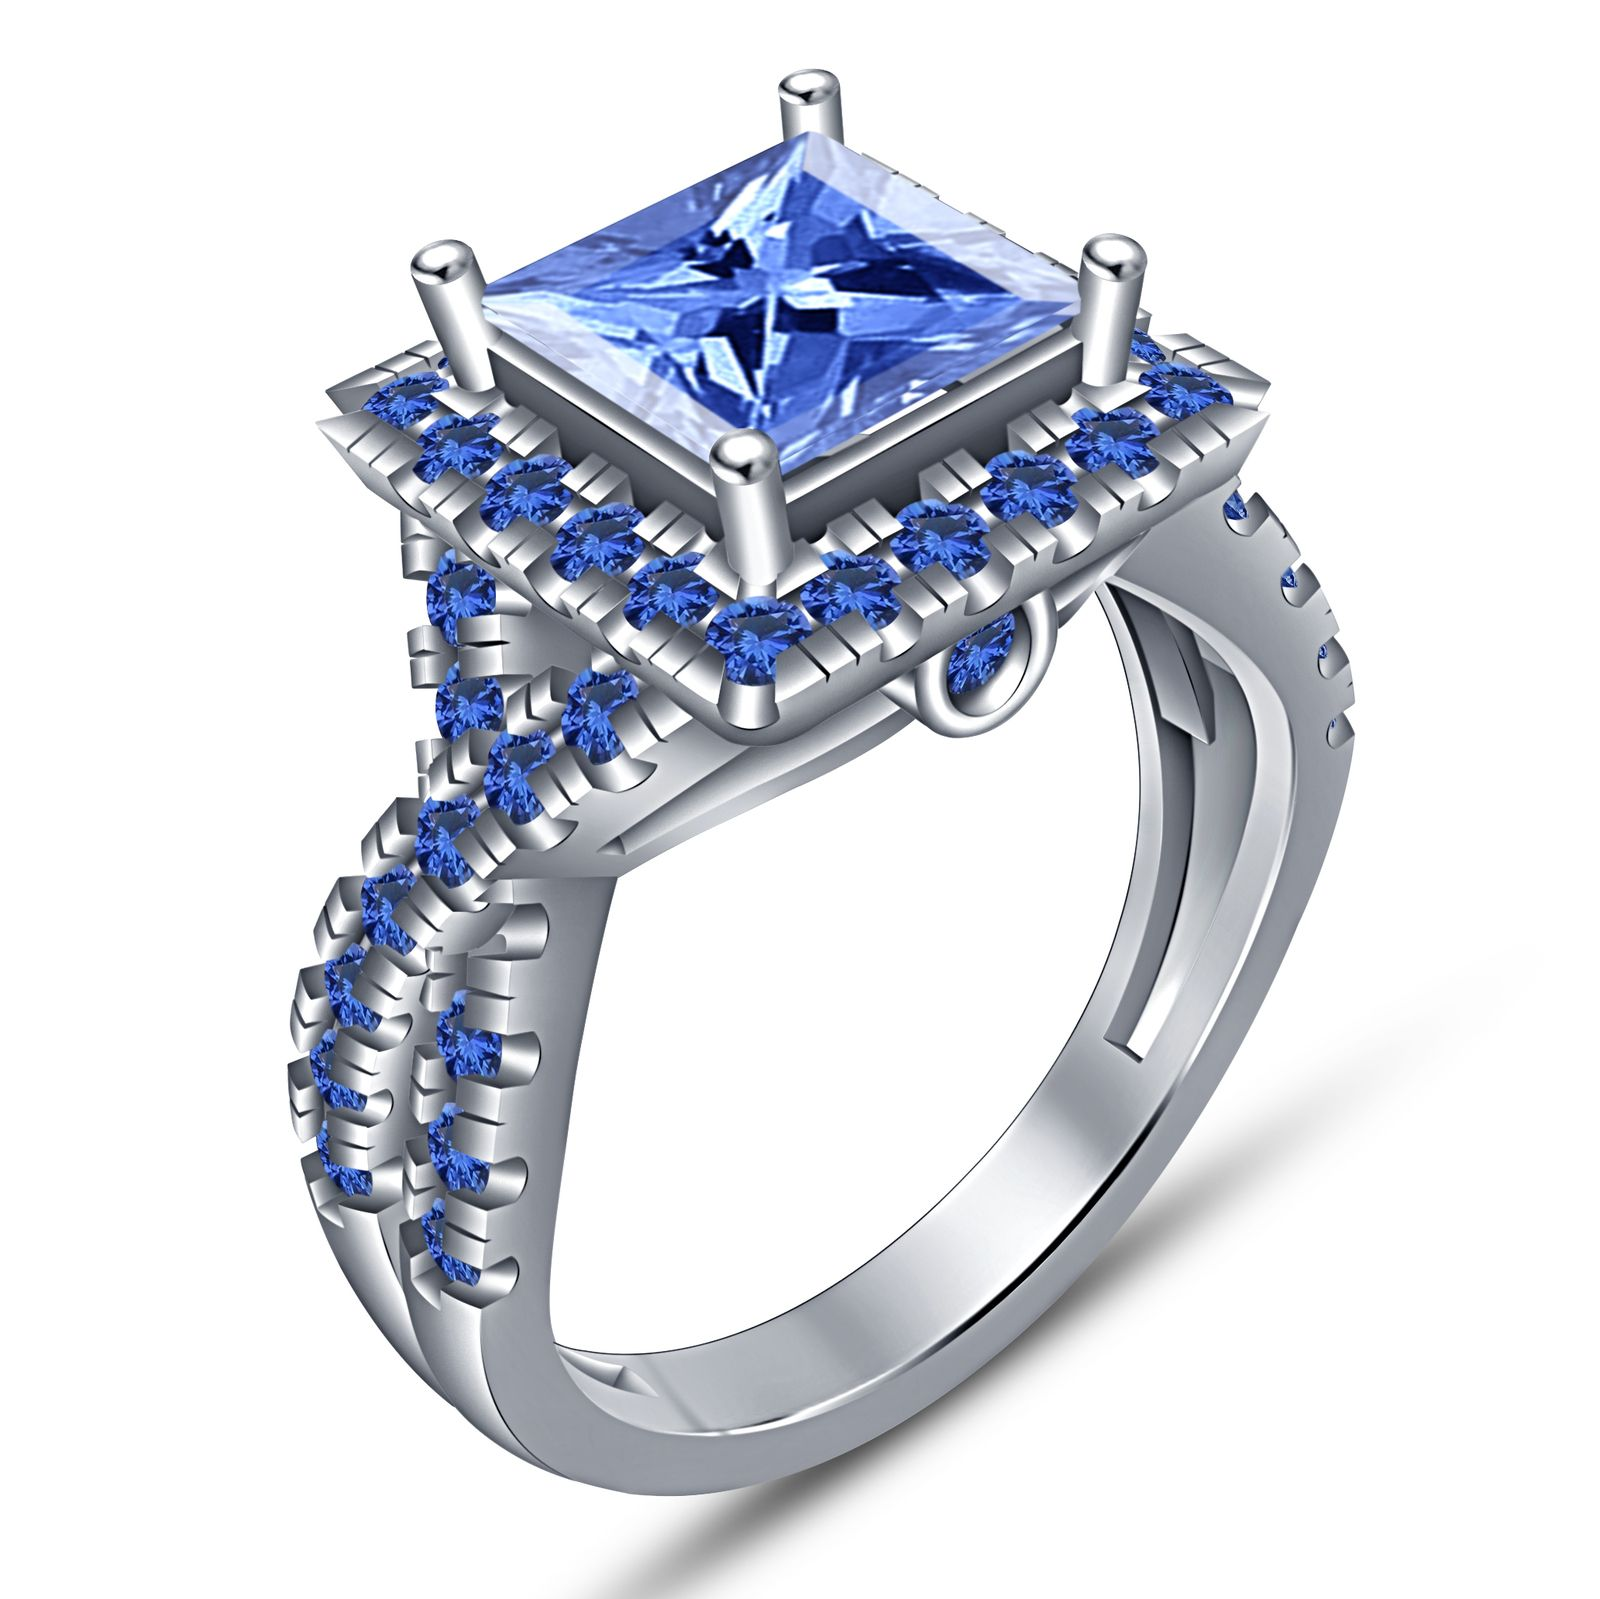 3 Ct Princess Cut blue Sapphire Diamond Bridal Engagement Ring 14K White Gold FN